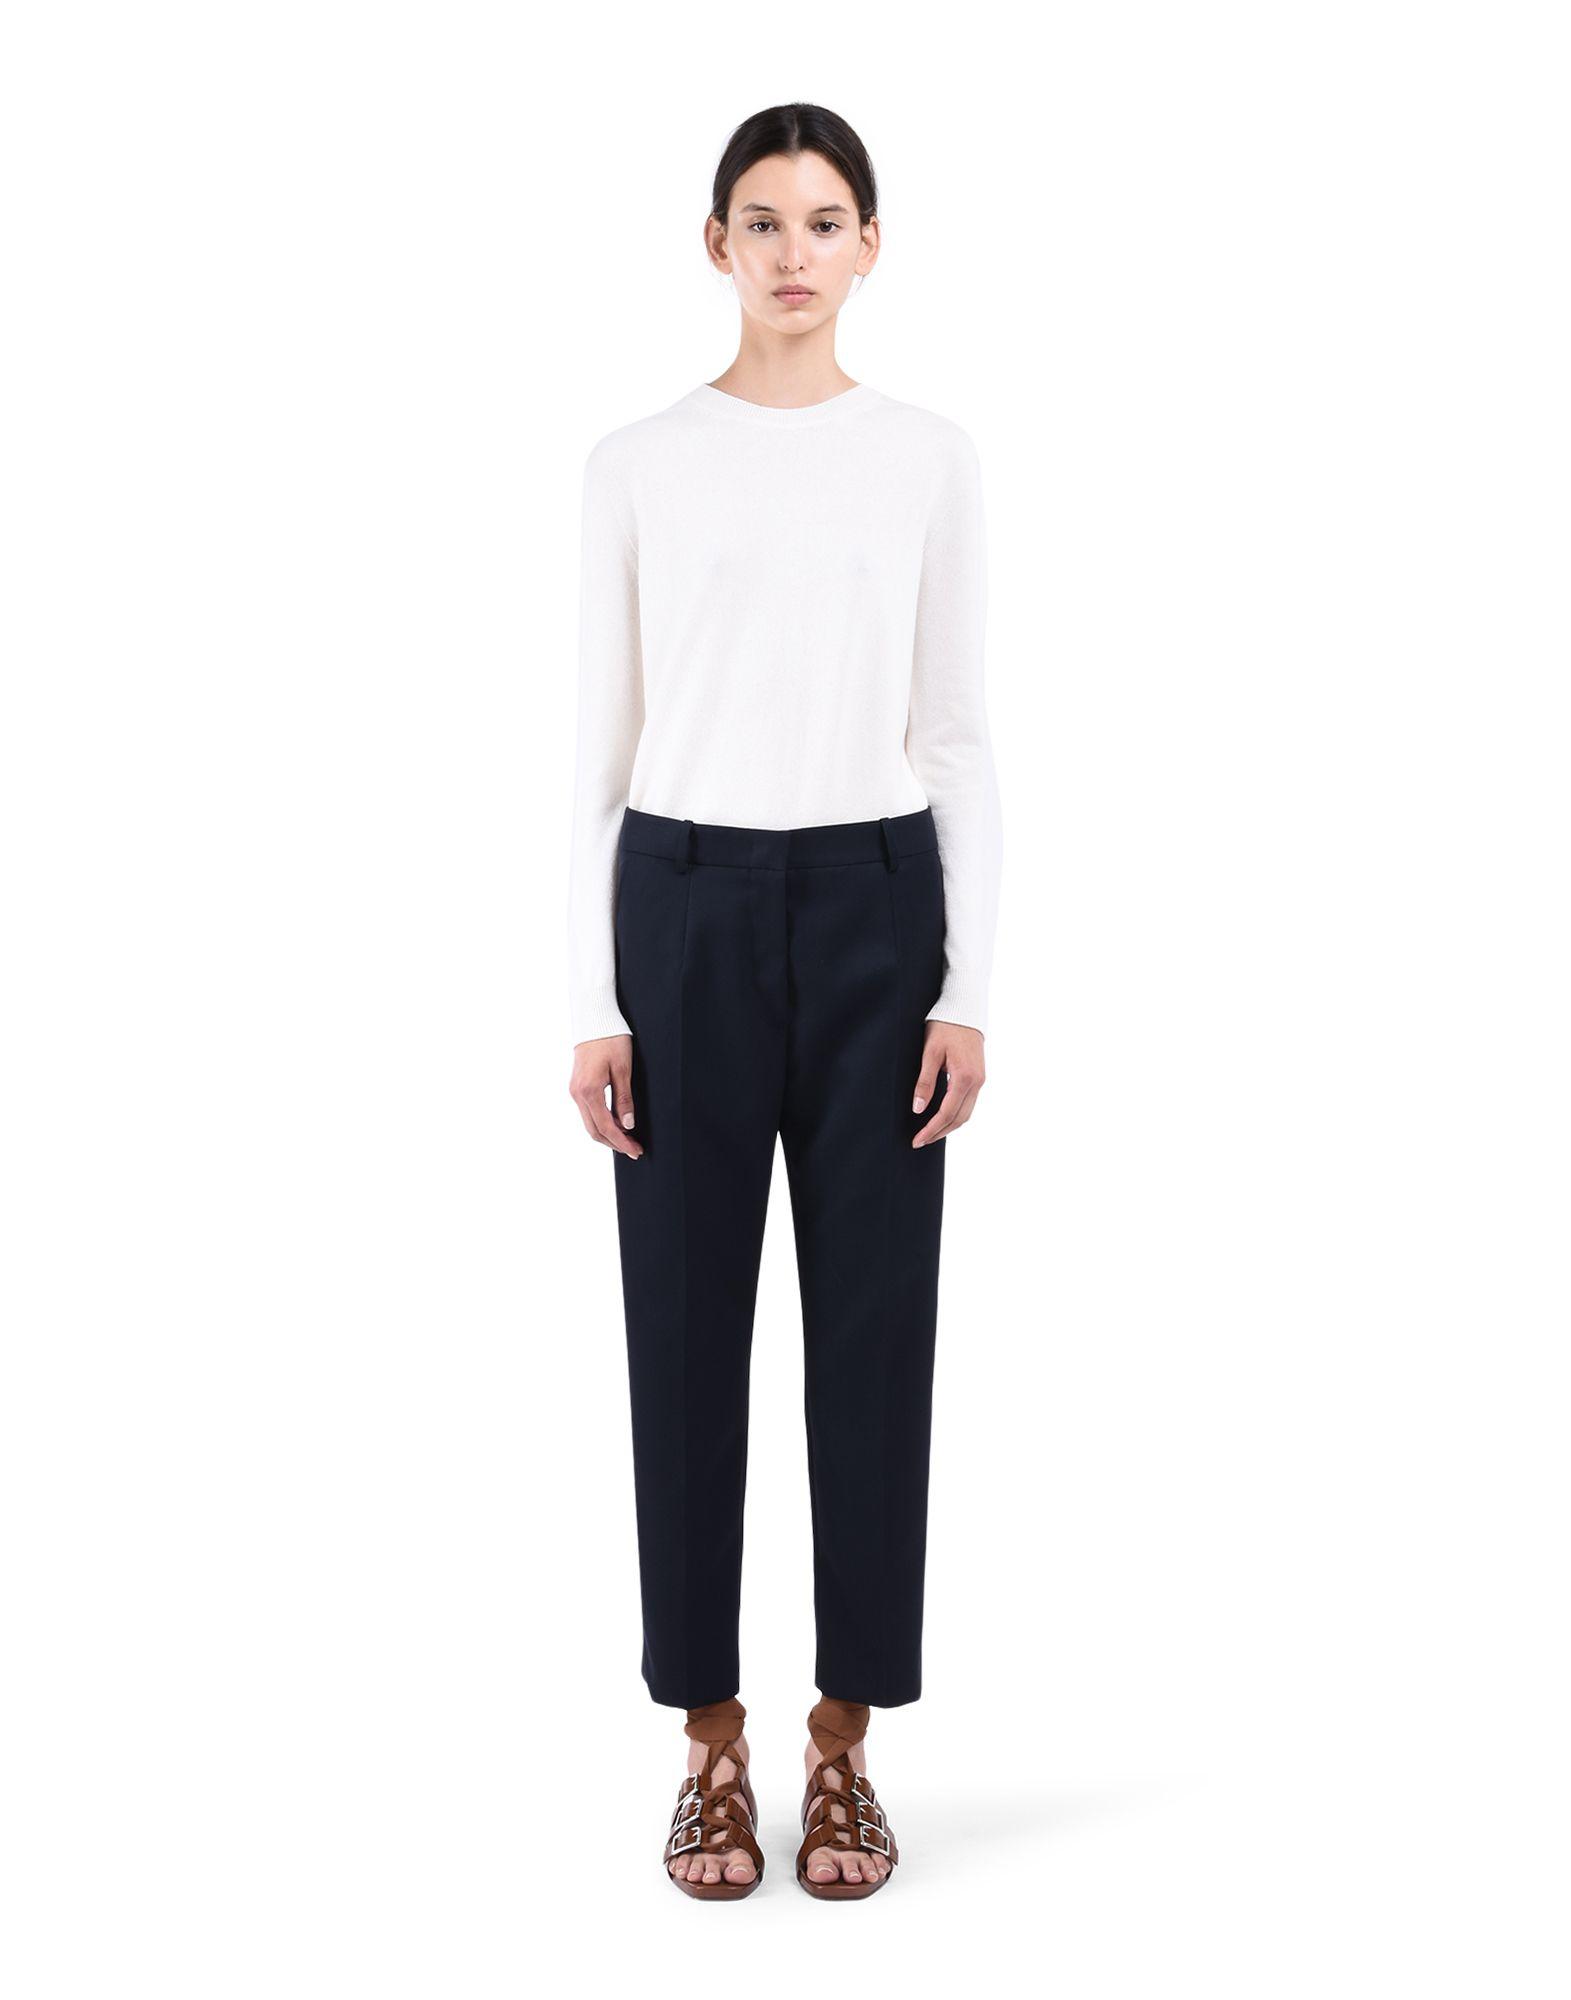 Cropped Trousers - JIL SANDER Online Store